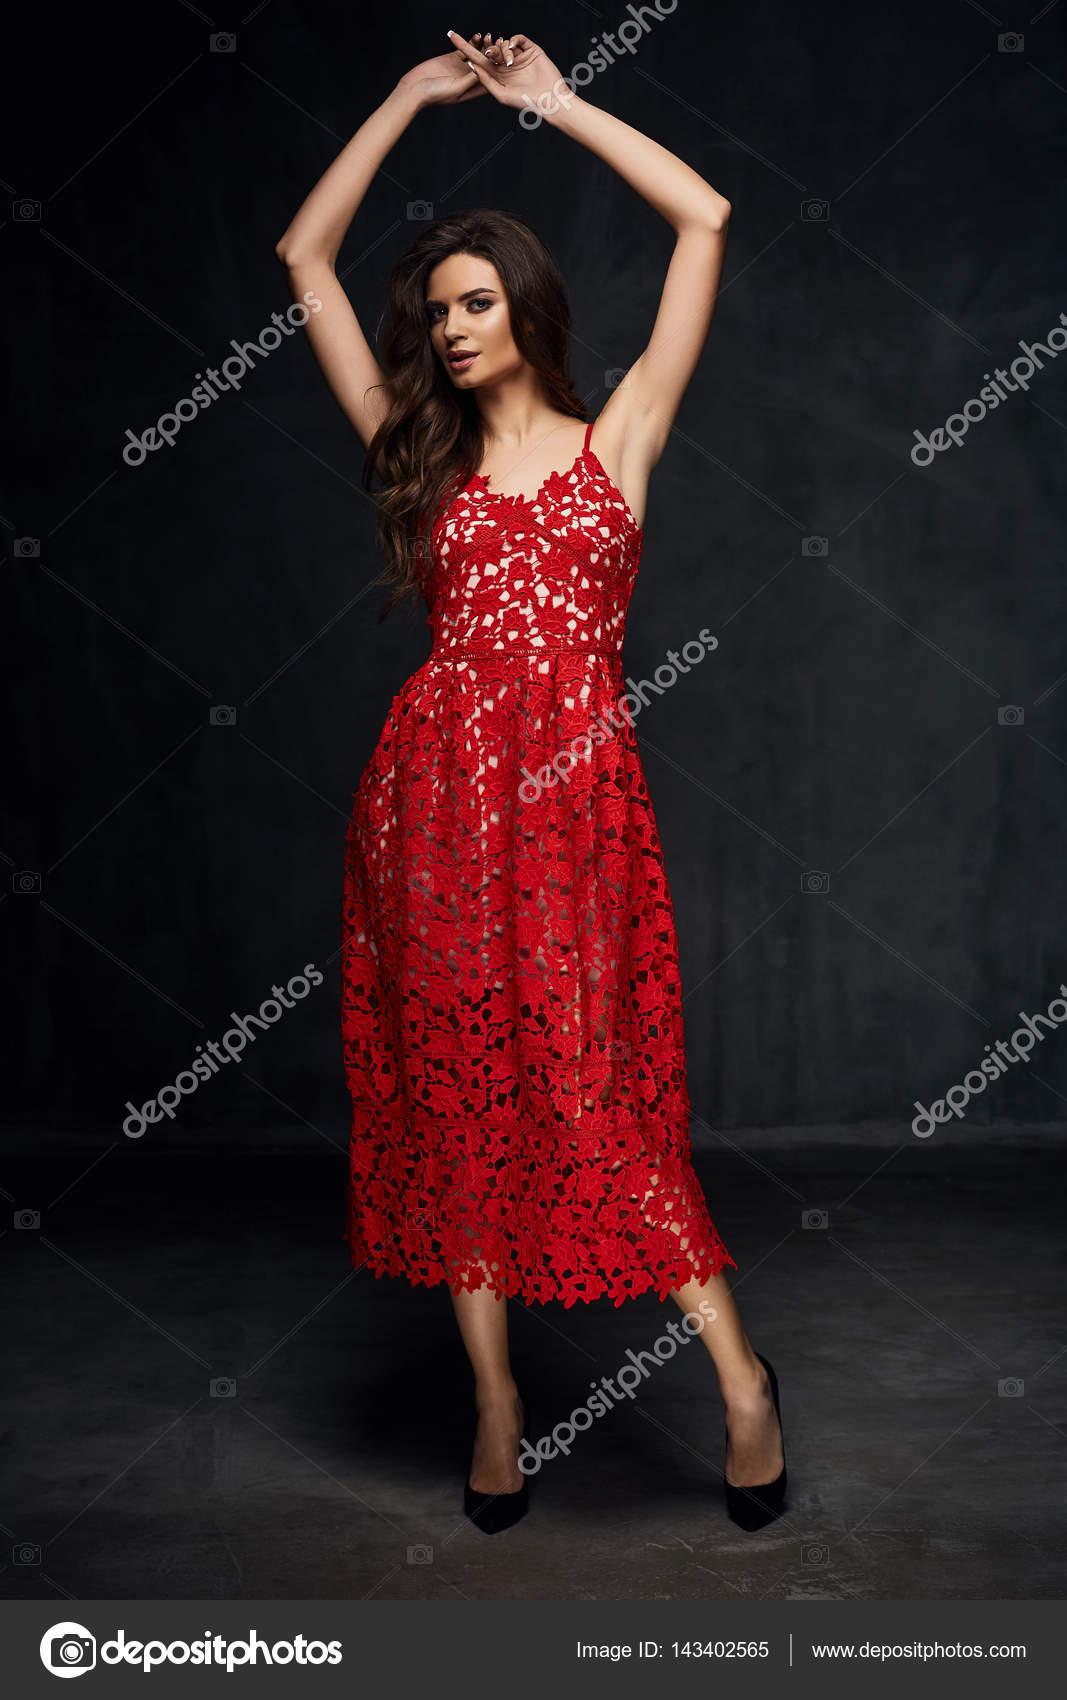 a077d37539be Όμορφη νεαρή σέξι μοντέλο θηλυκό με σκούρα μαλλιά στο καταπληκτικό καιρό κόκκινη  δαντέλα φόρεμα και μαύρα